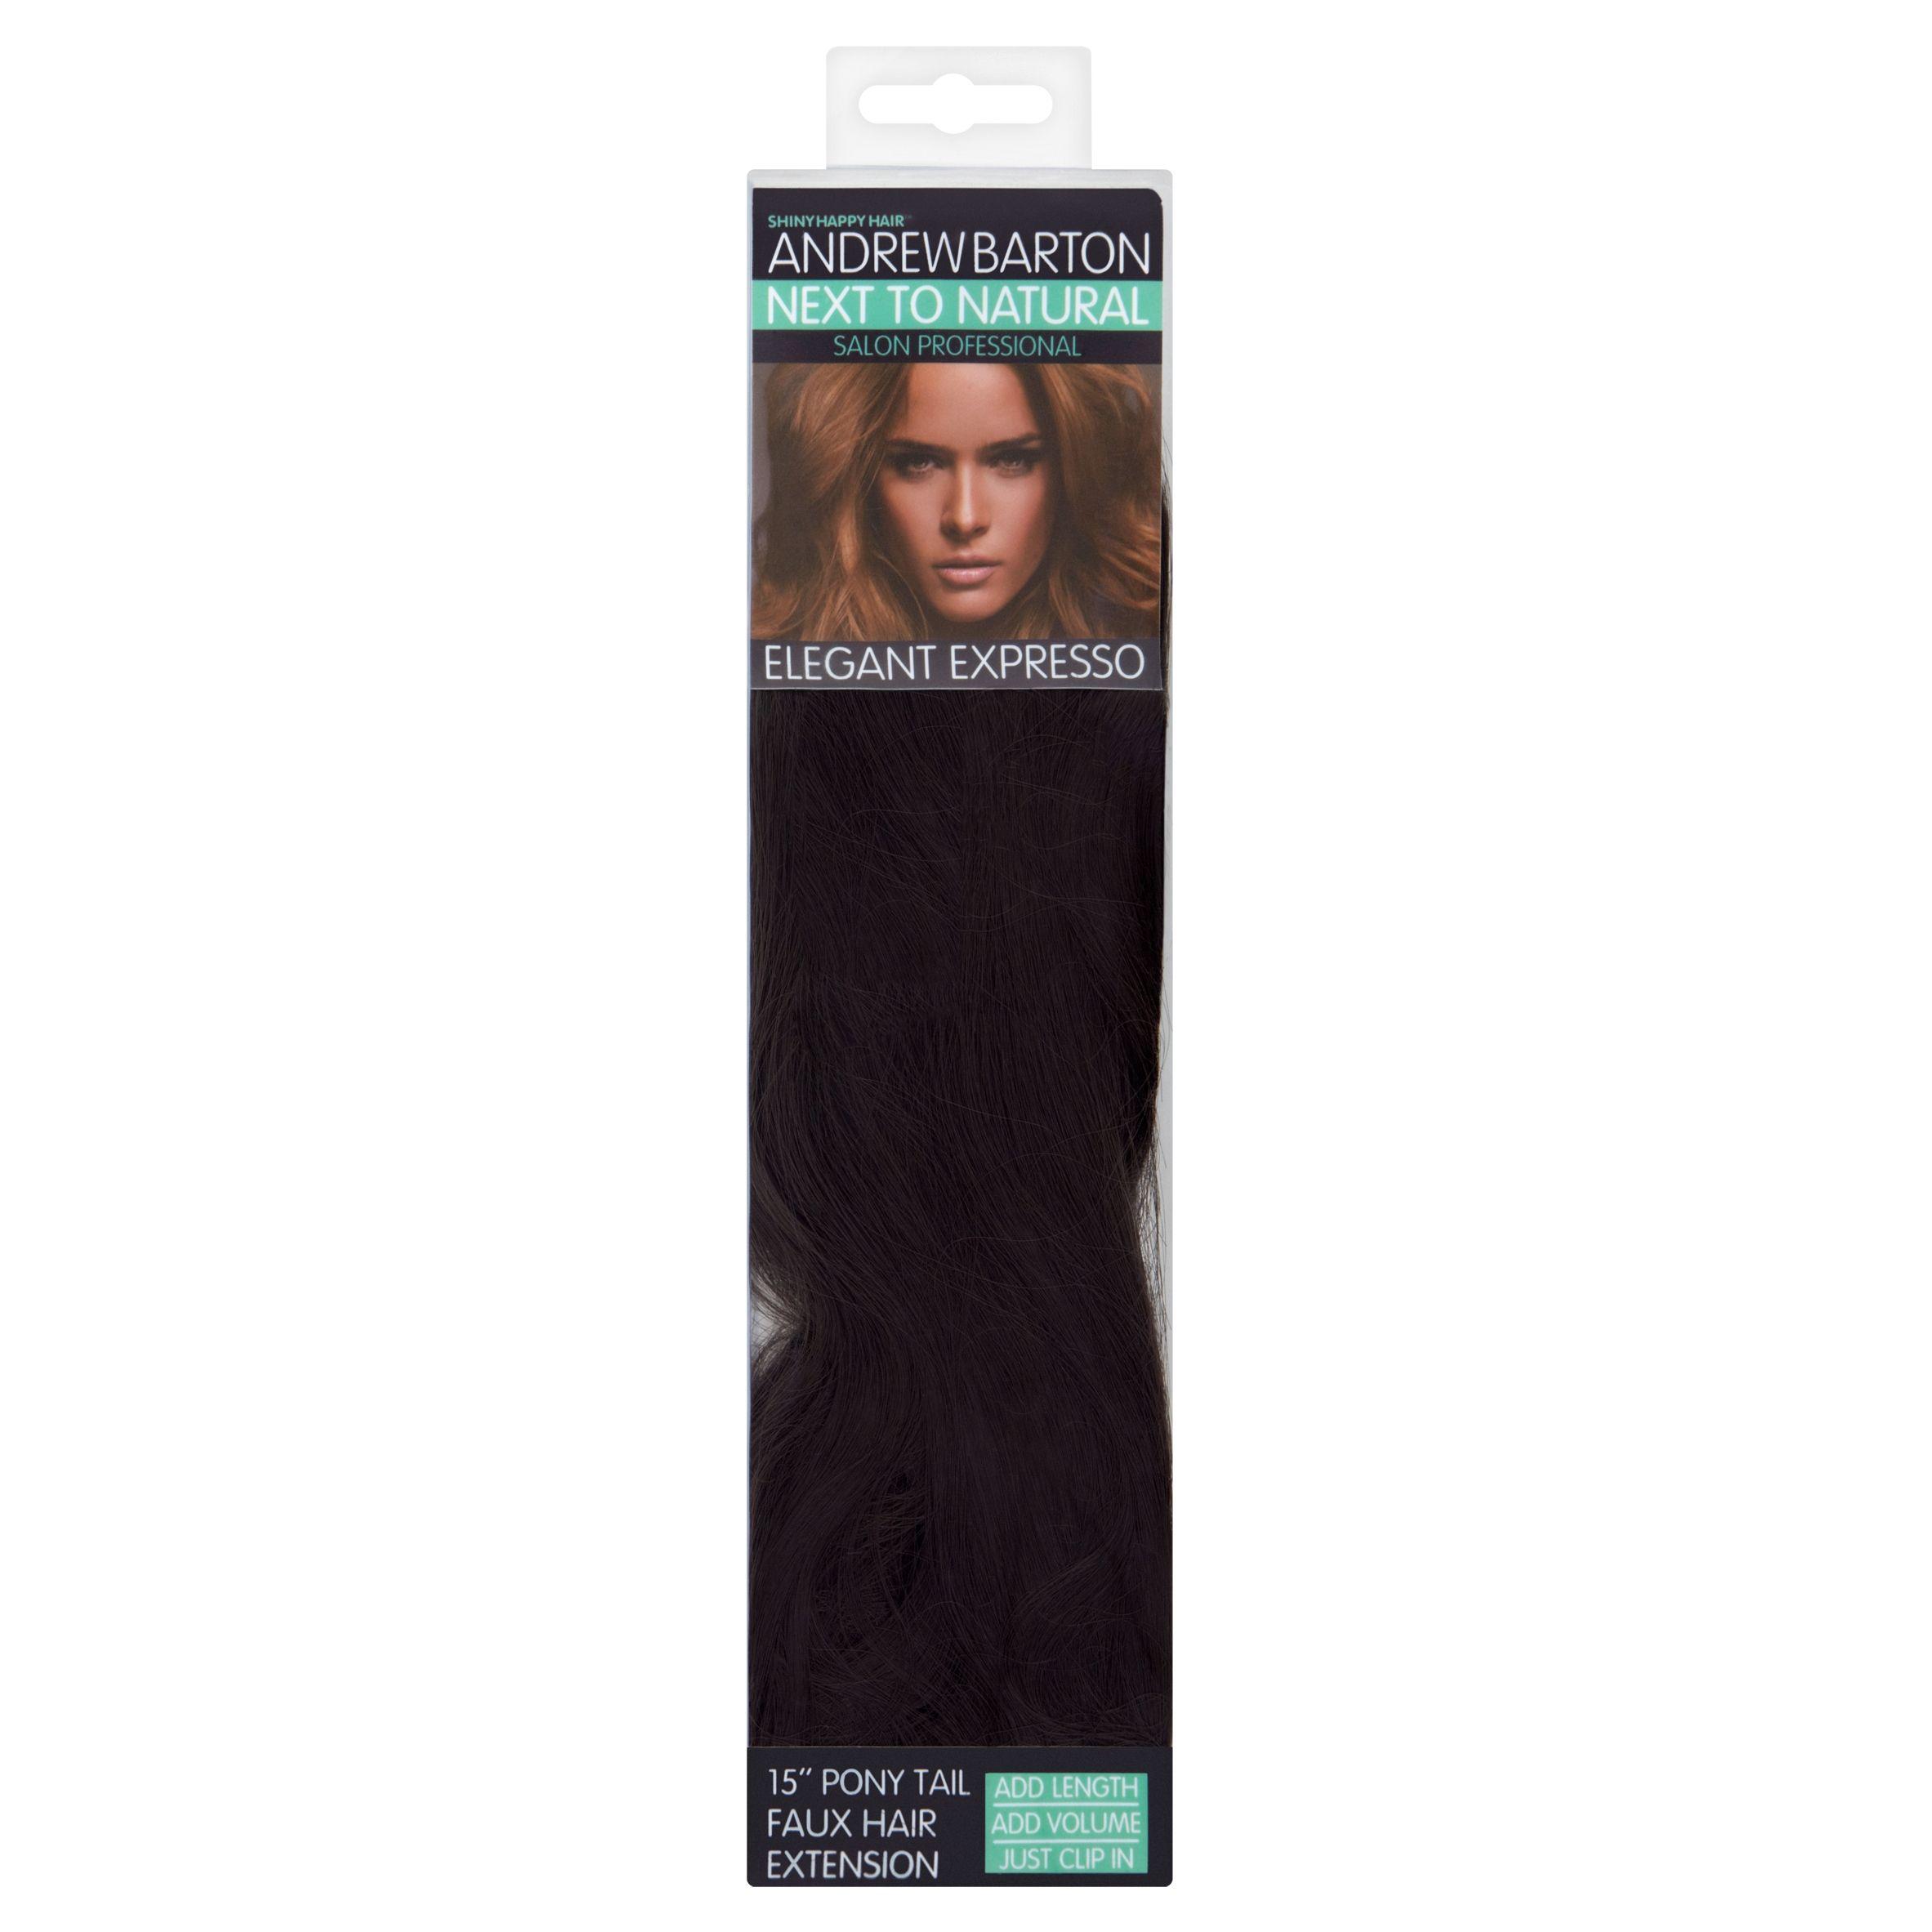 Andrew Barton Elegant Espresso Ponytail And Wrap Hair Extension